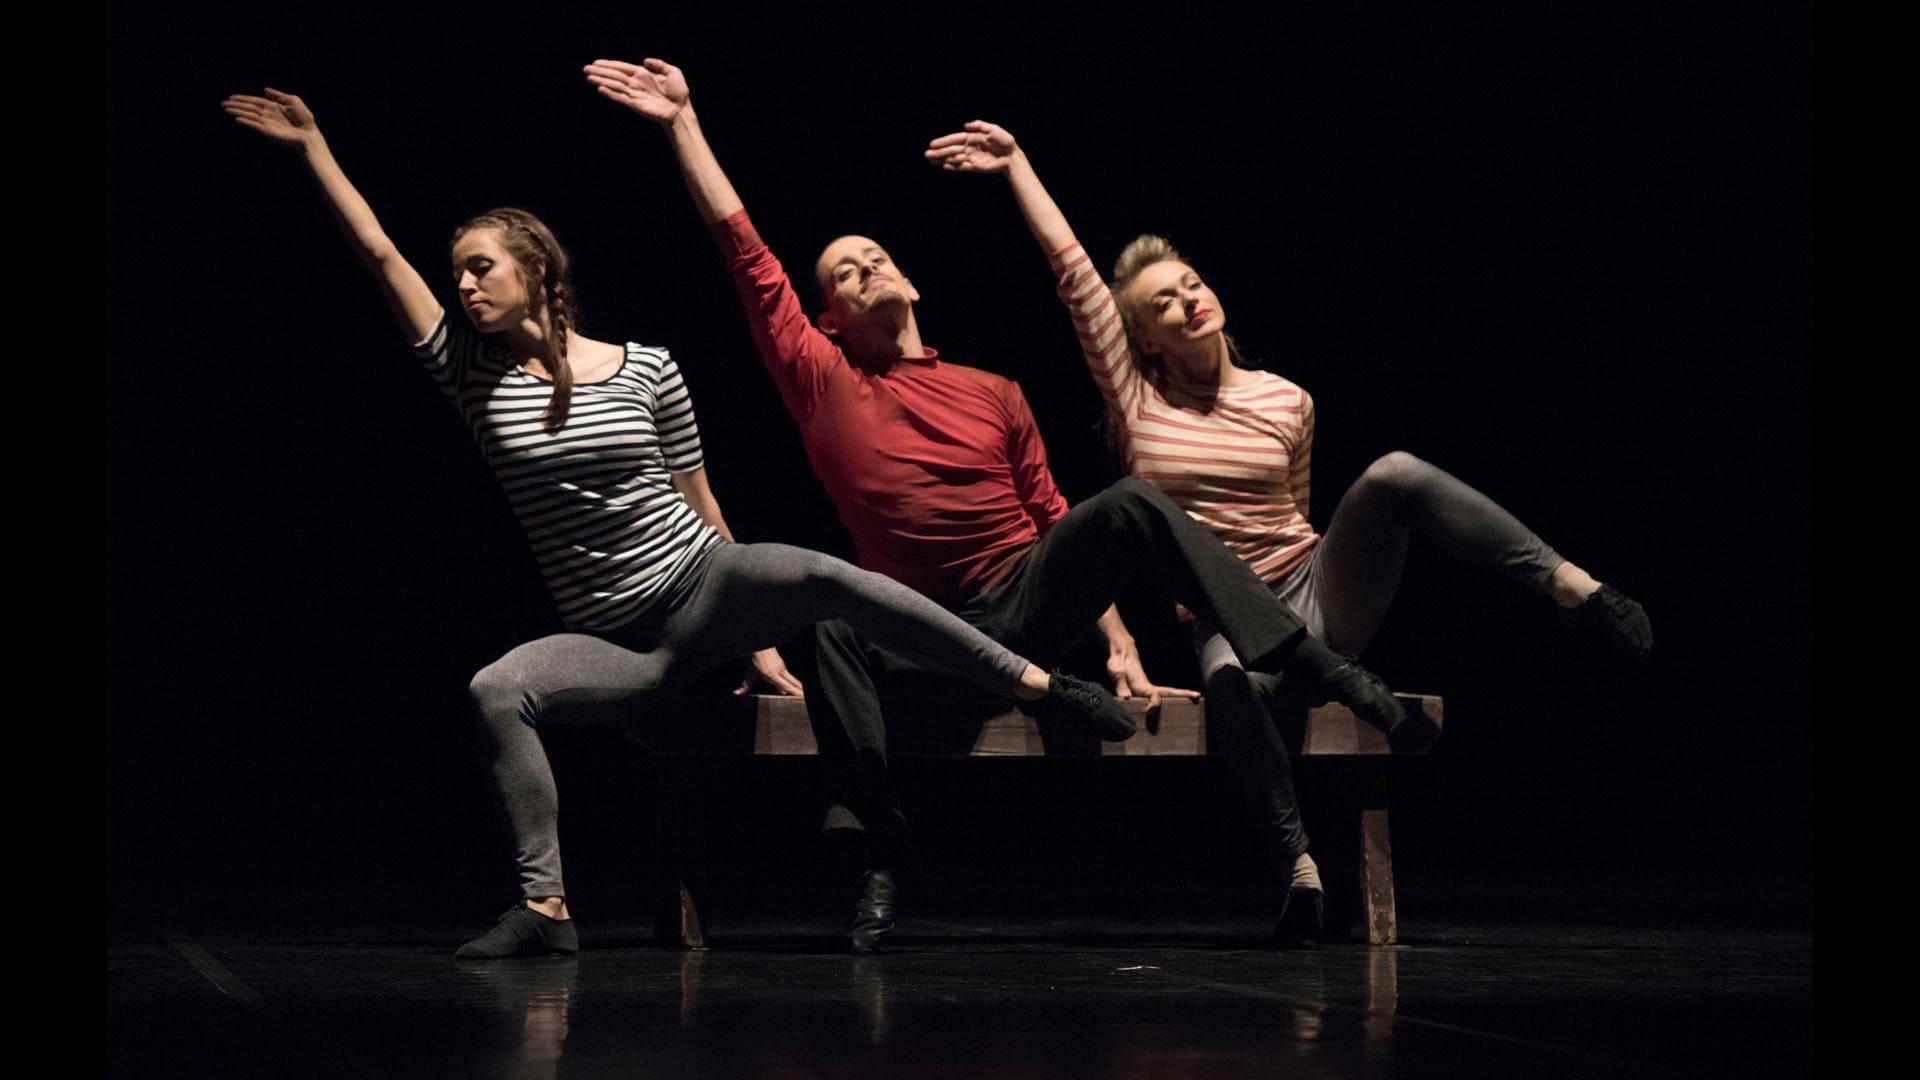 ТЕАТР Kyiv Modern Ballet. Ближе, чем любовь, 1984. Другая-12